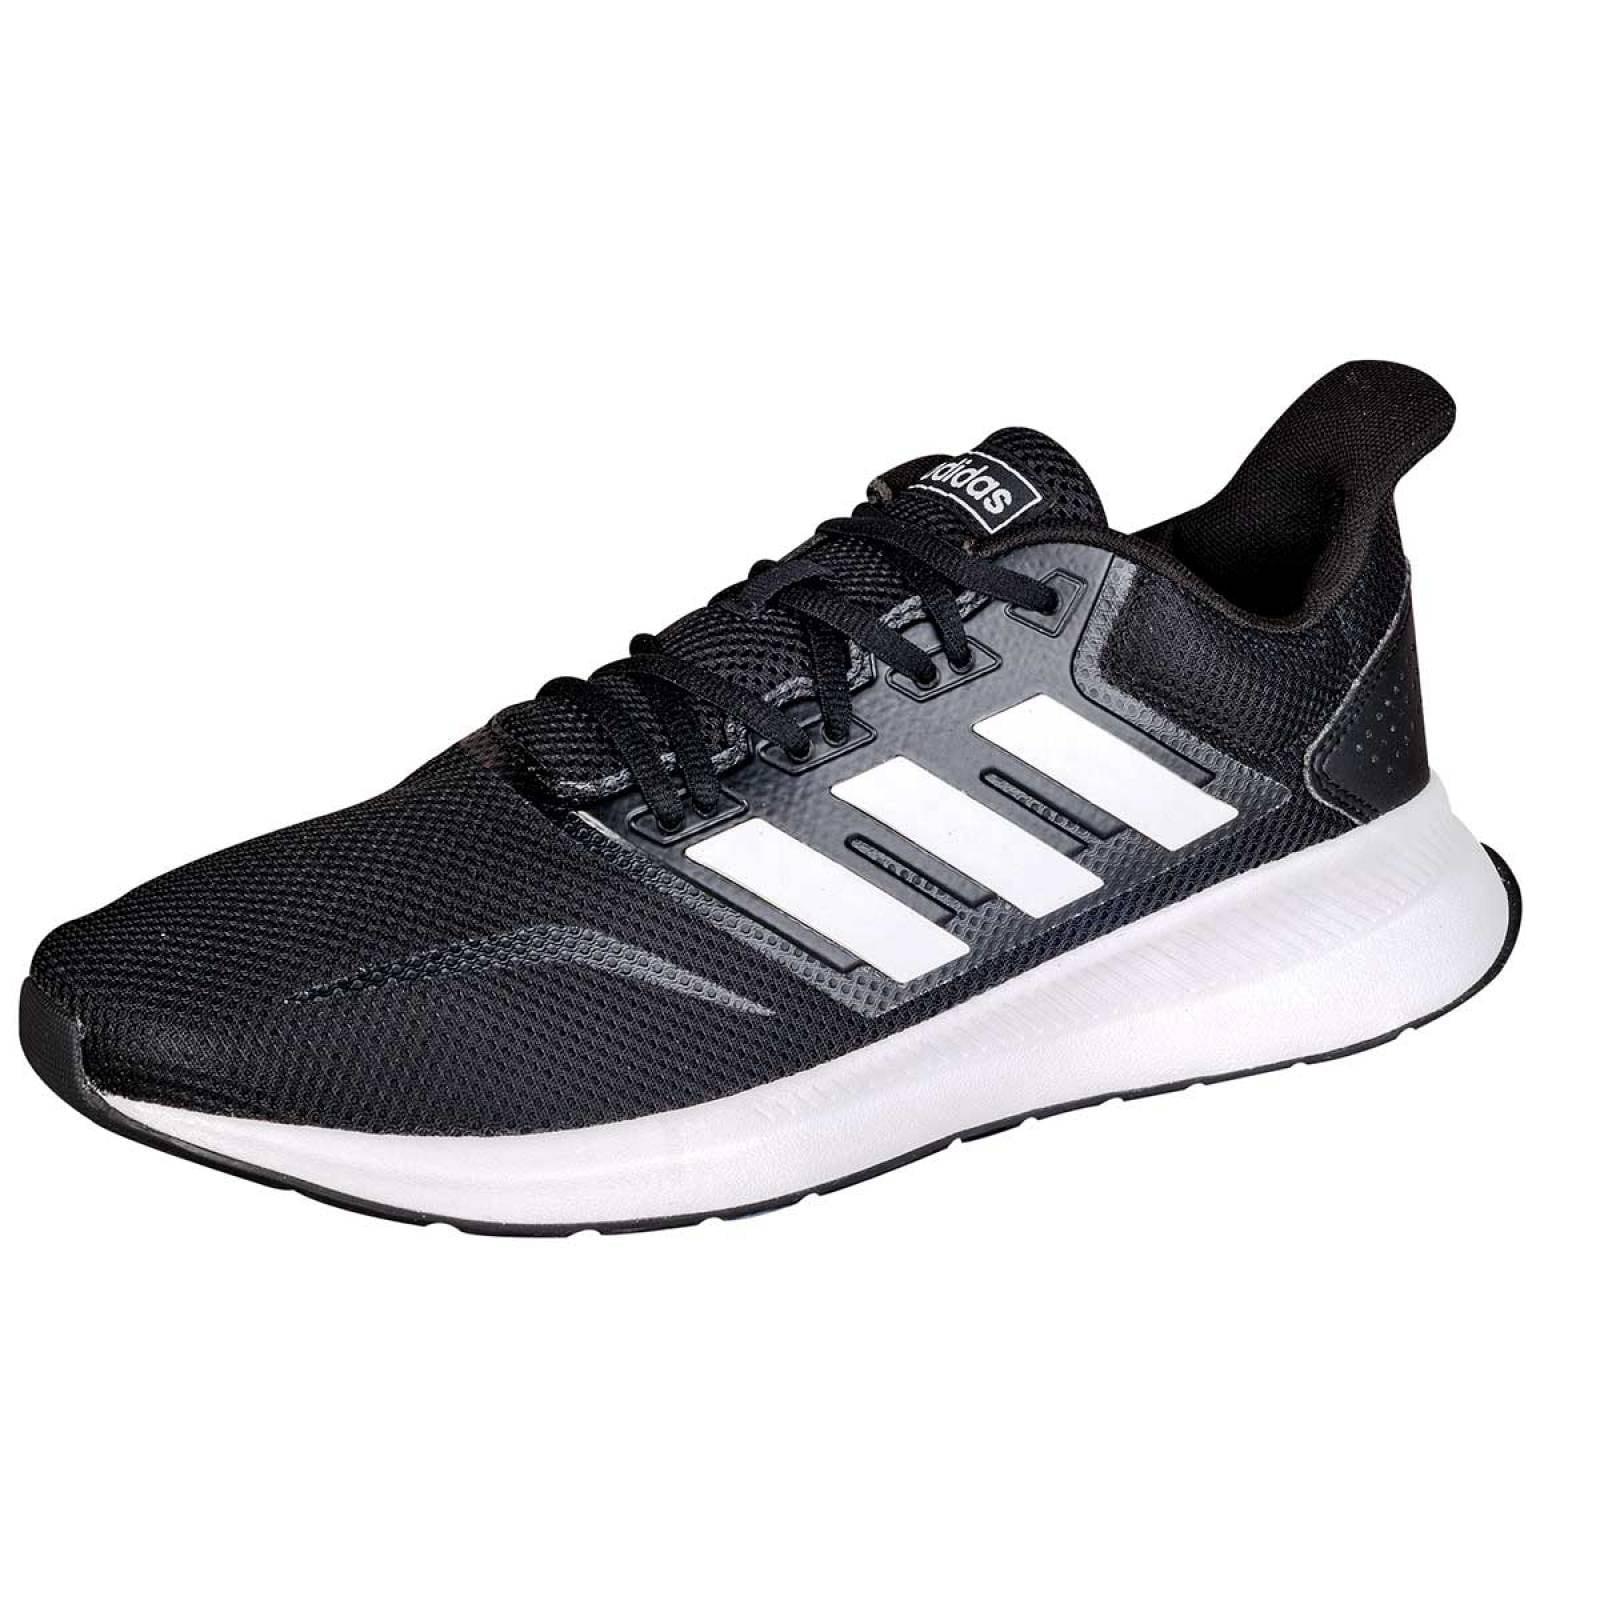 Adidas Tenis Hombre Negro blanco